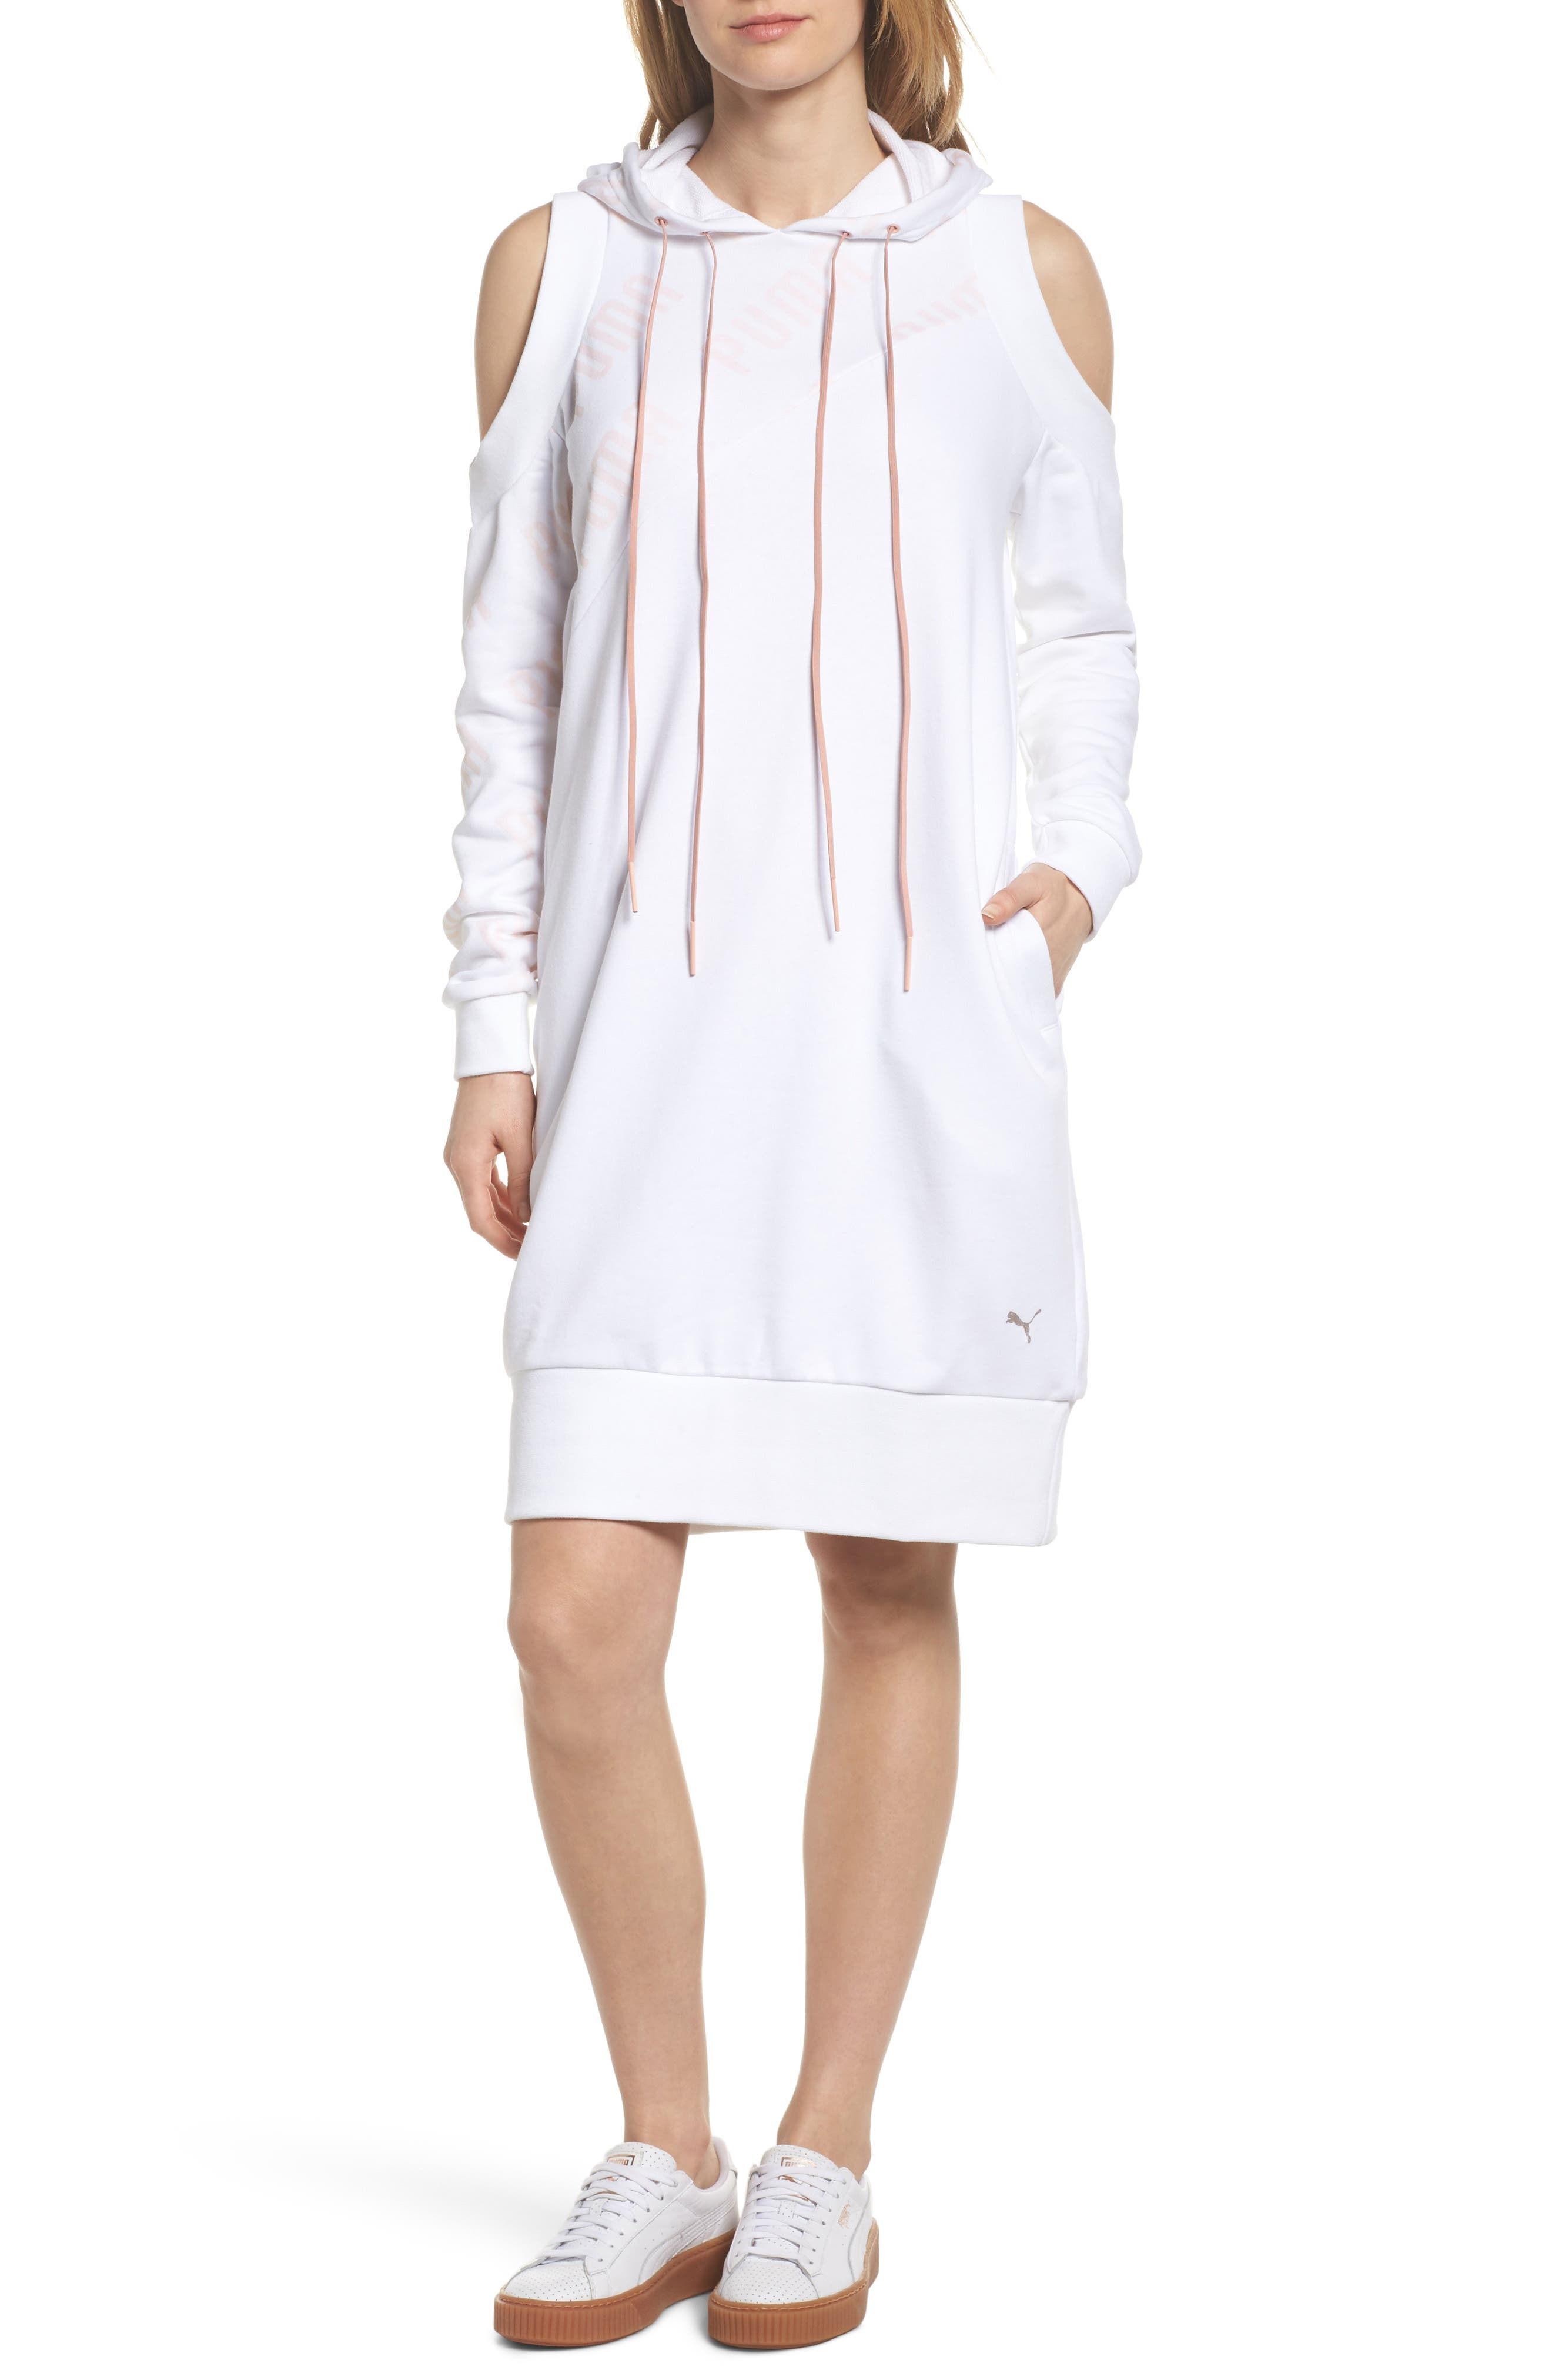 En Pointe Drawstring Dress,                             Main thumbnail 1, color,                             Puma White